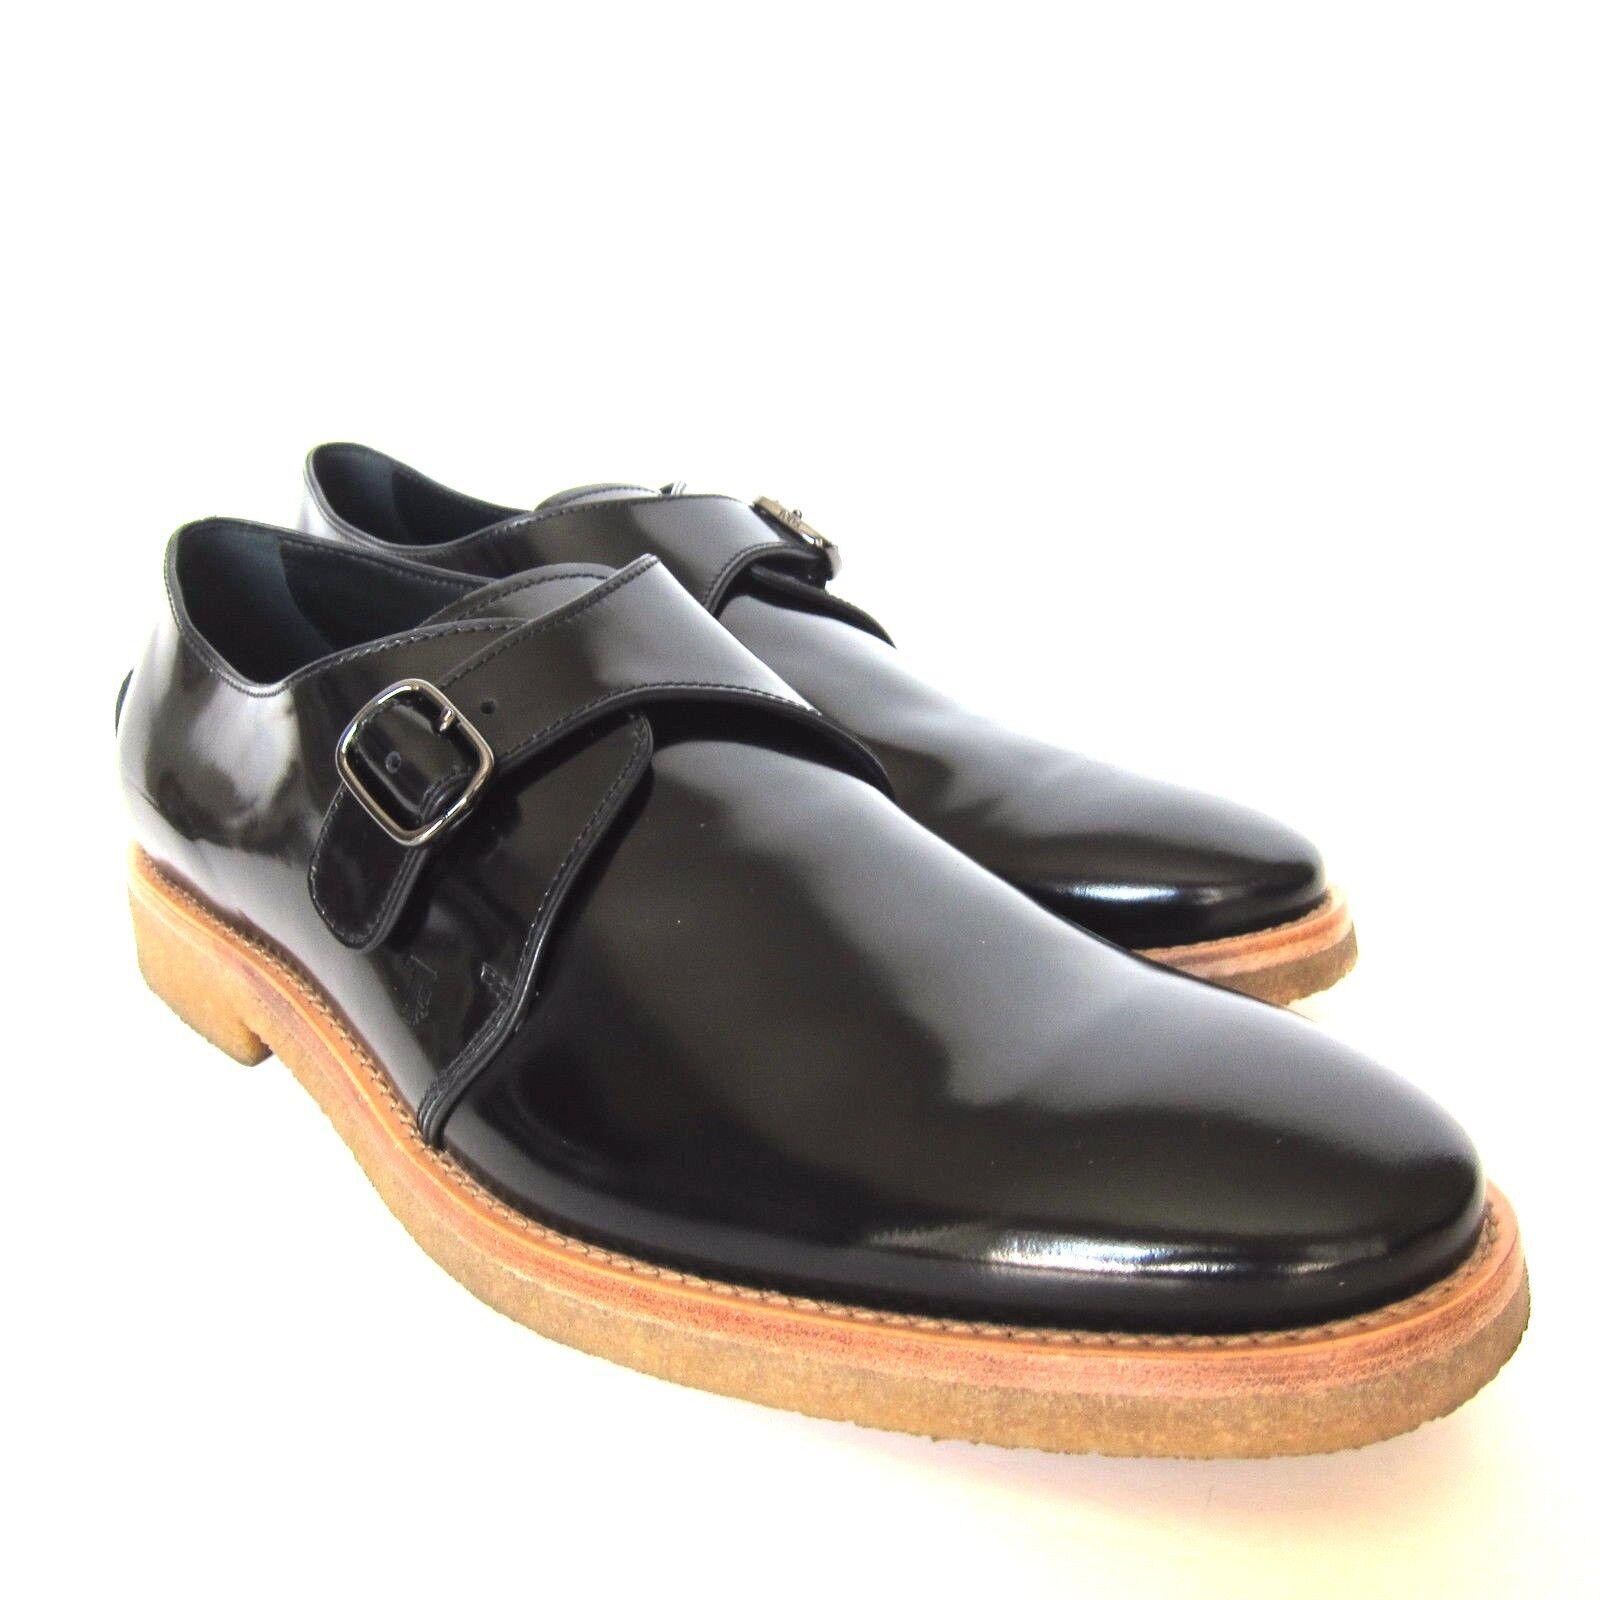 W-813149 Nuevo Tods Negro Charol Charol Charol Lado Hebilla Zapato Marcado Talla 10.5 US-11.5 27b2b7